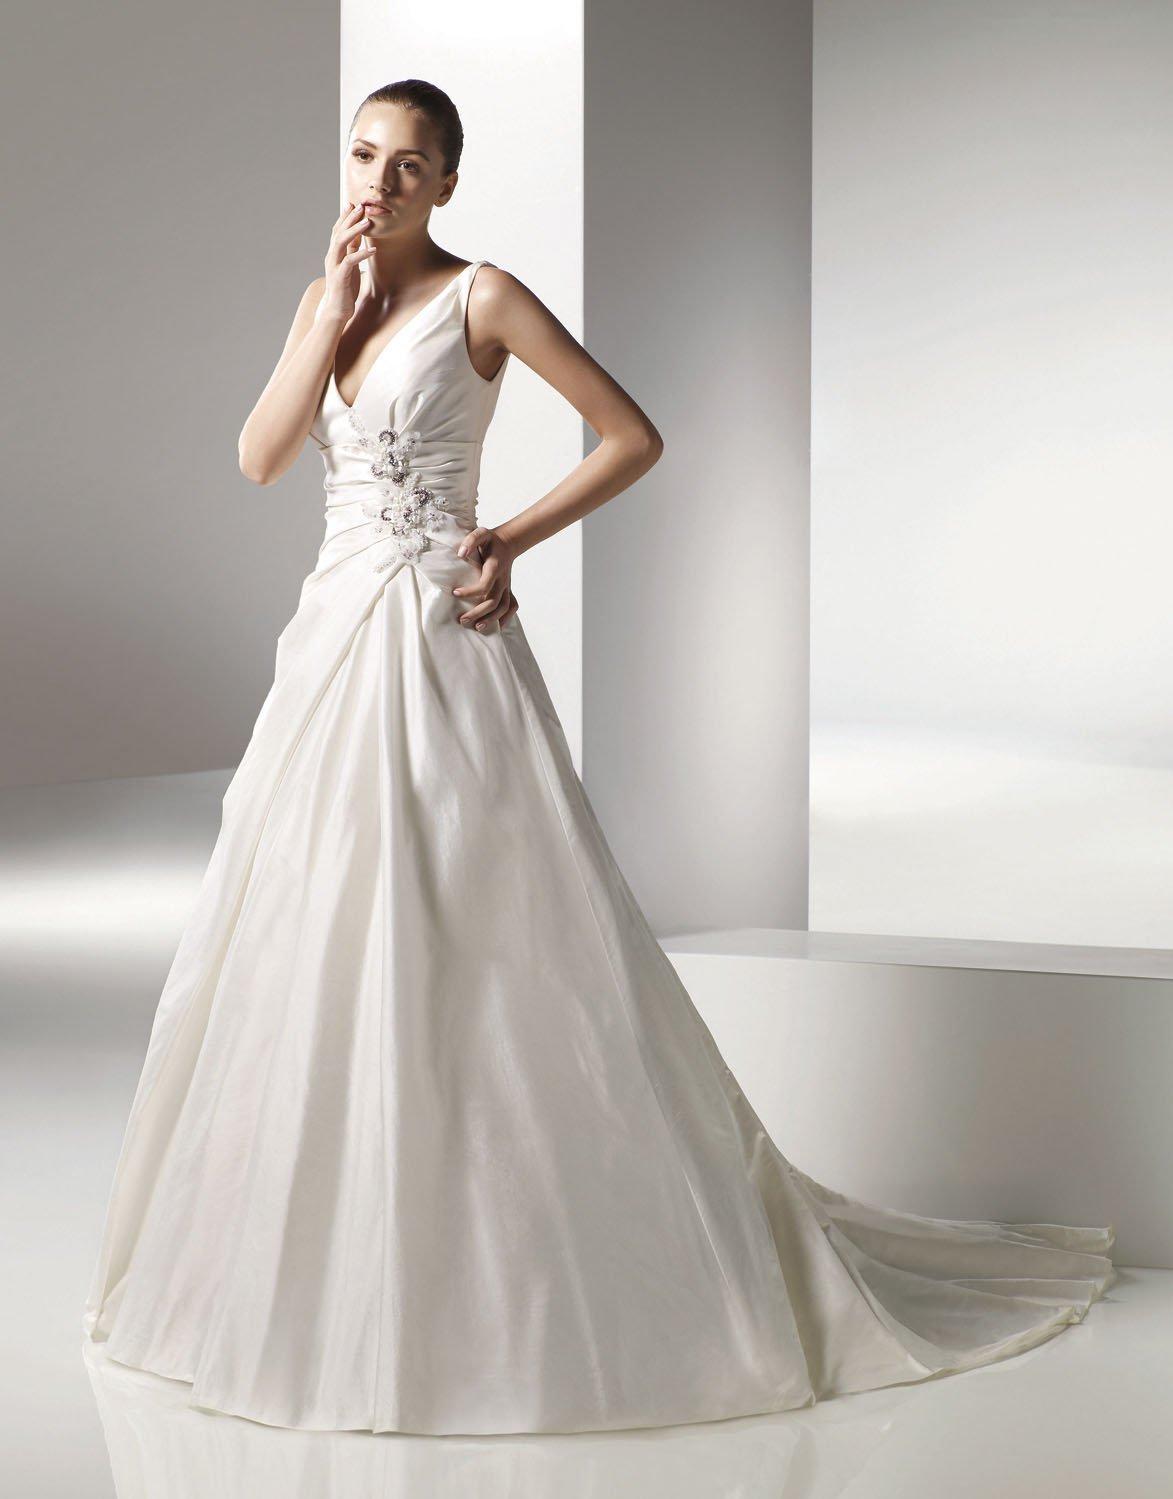 V-neckline A-line Appliques Taffeta Wedding Dress Bridal Gown aq0040